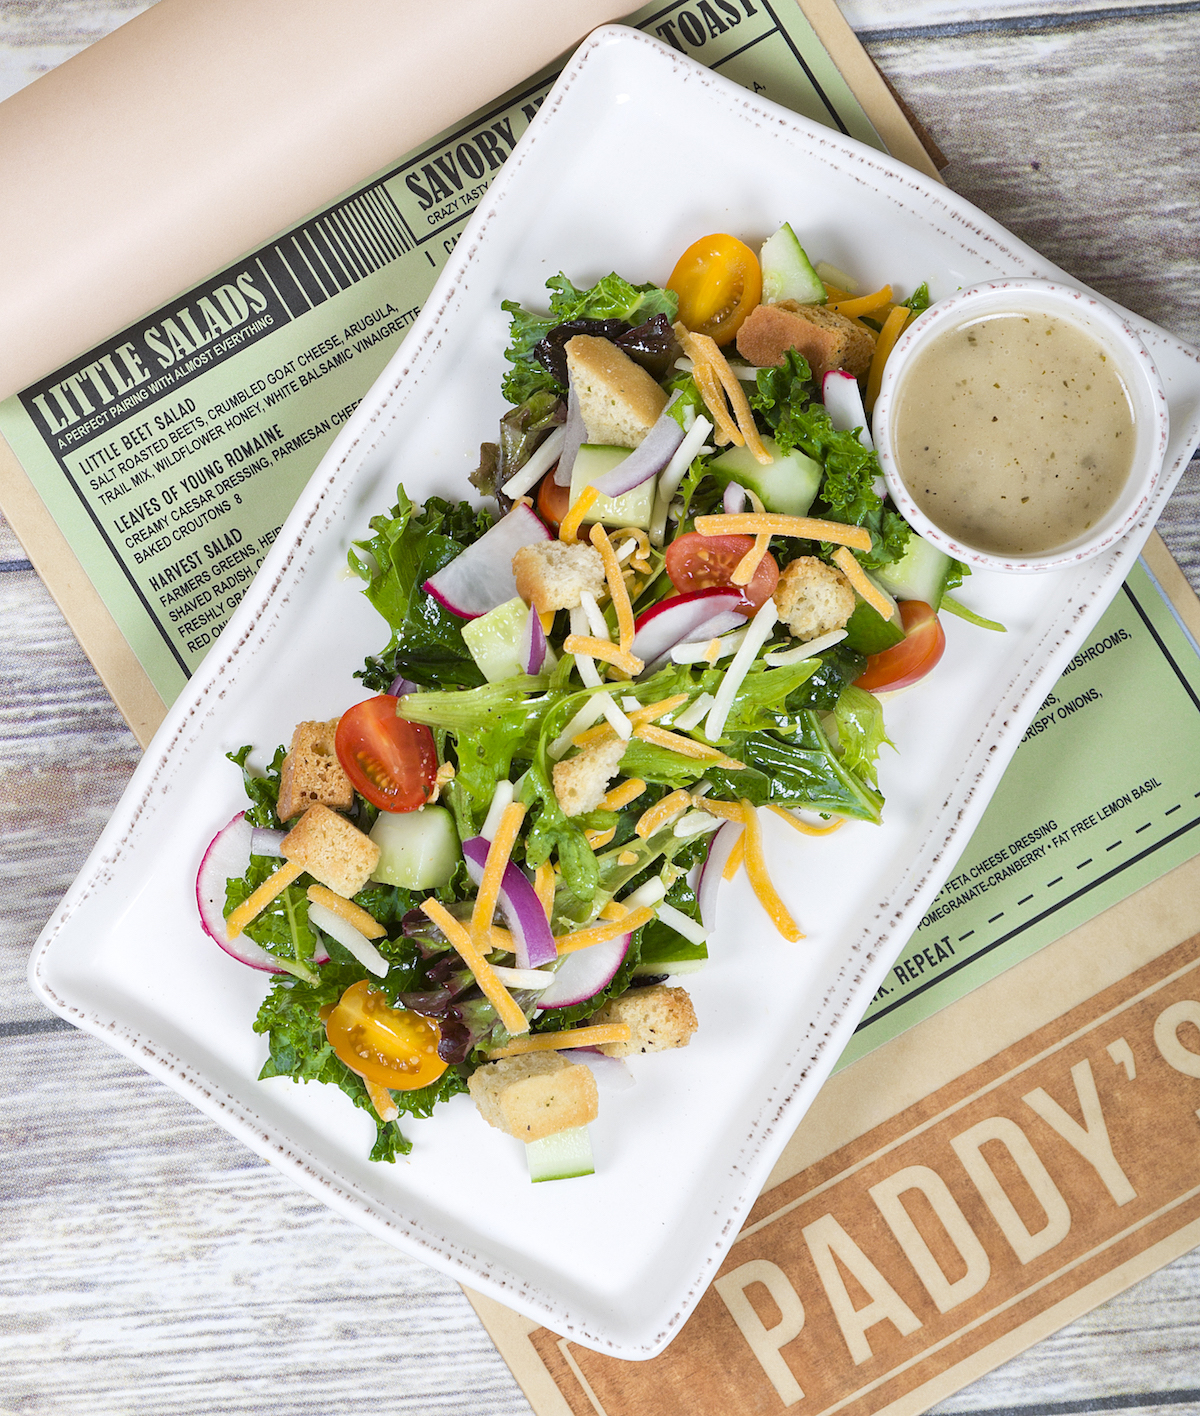 Paddys-Portsmouth-Salad-1.jpg